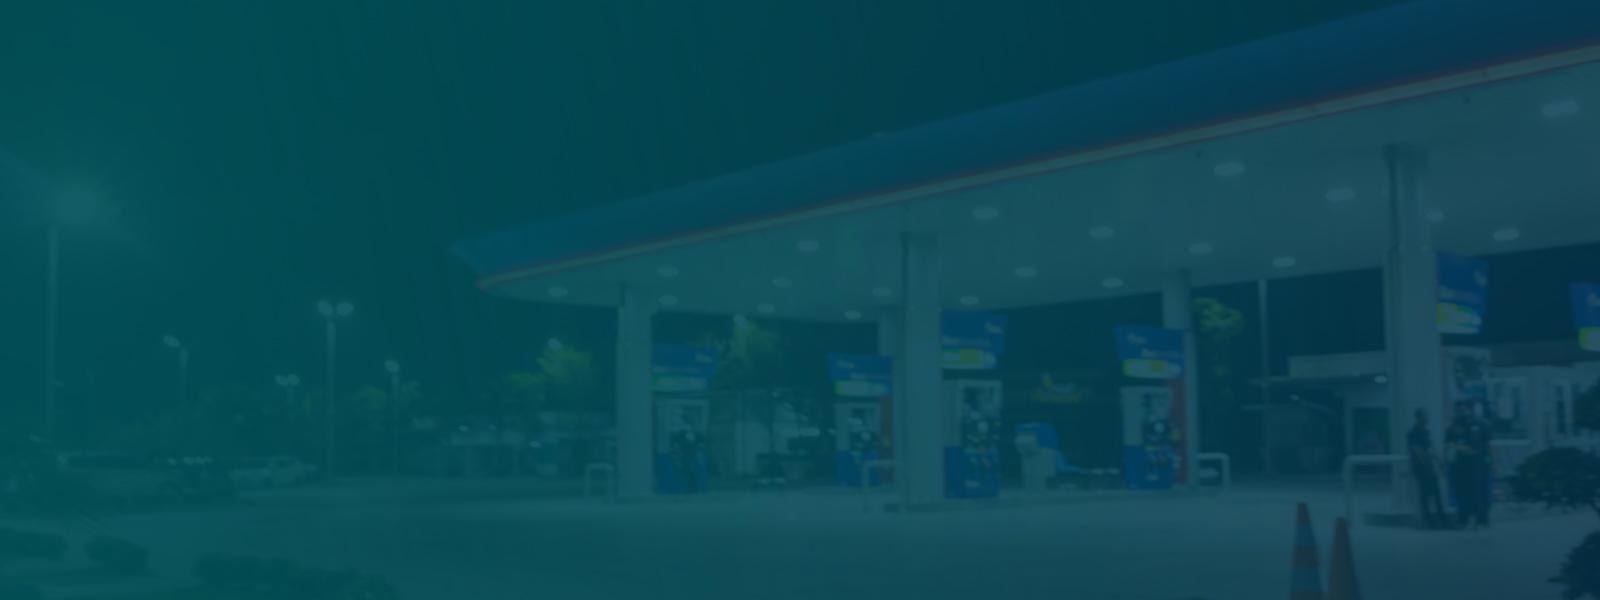 cs-petroleum-head